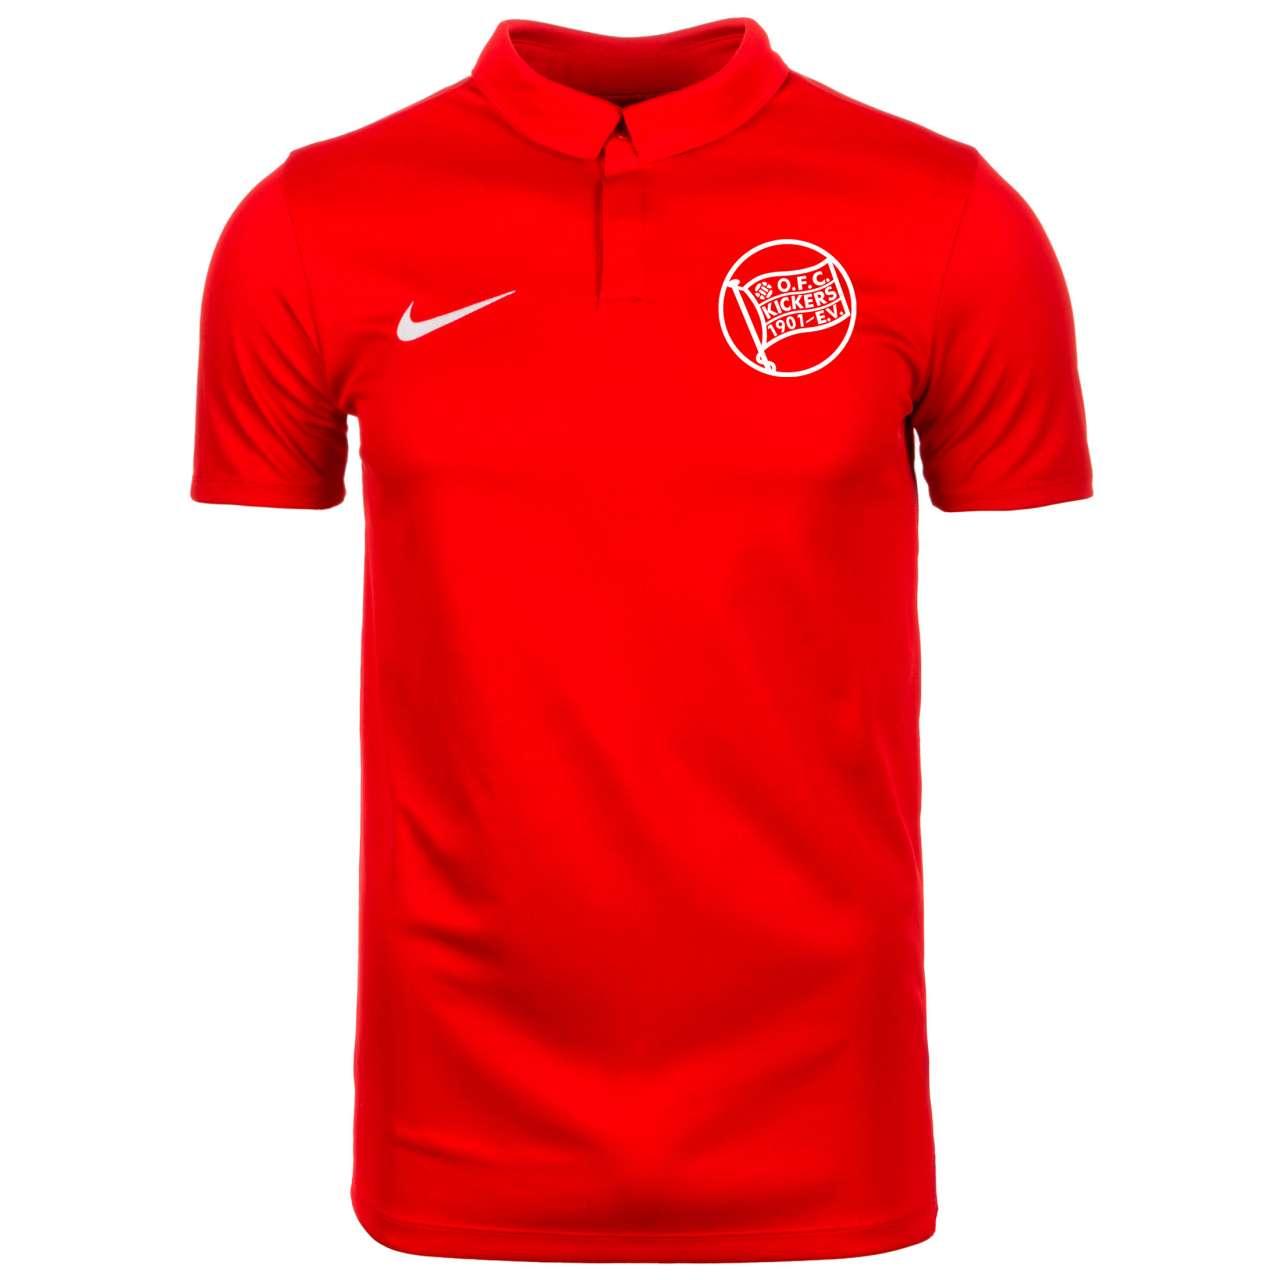 Nike Polo 18/19